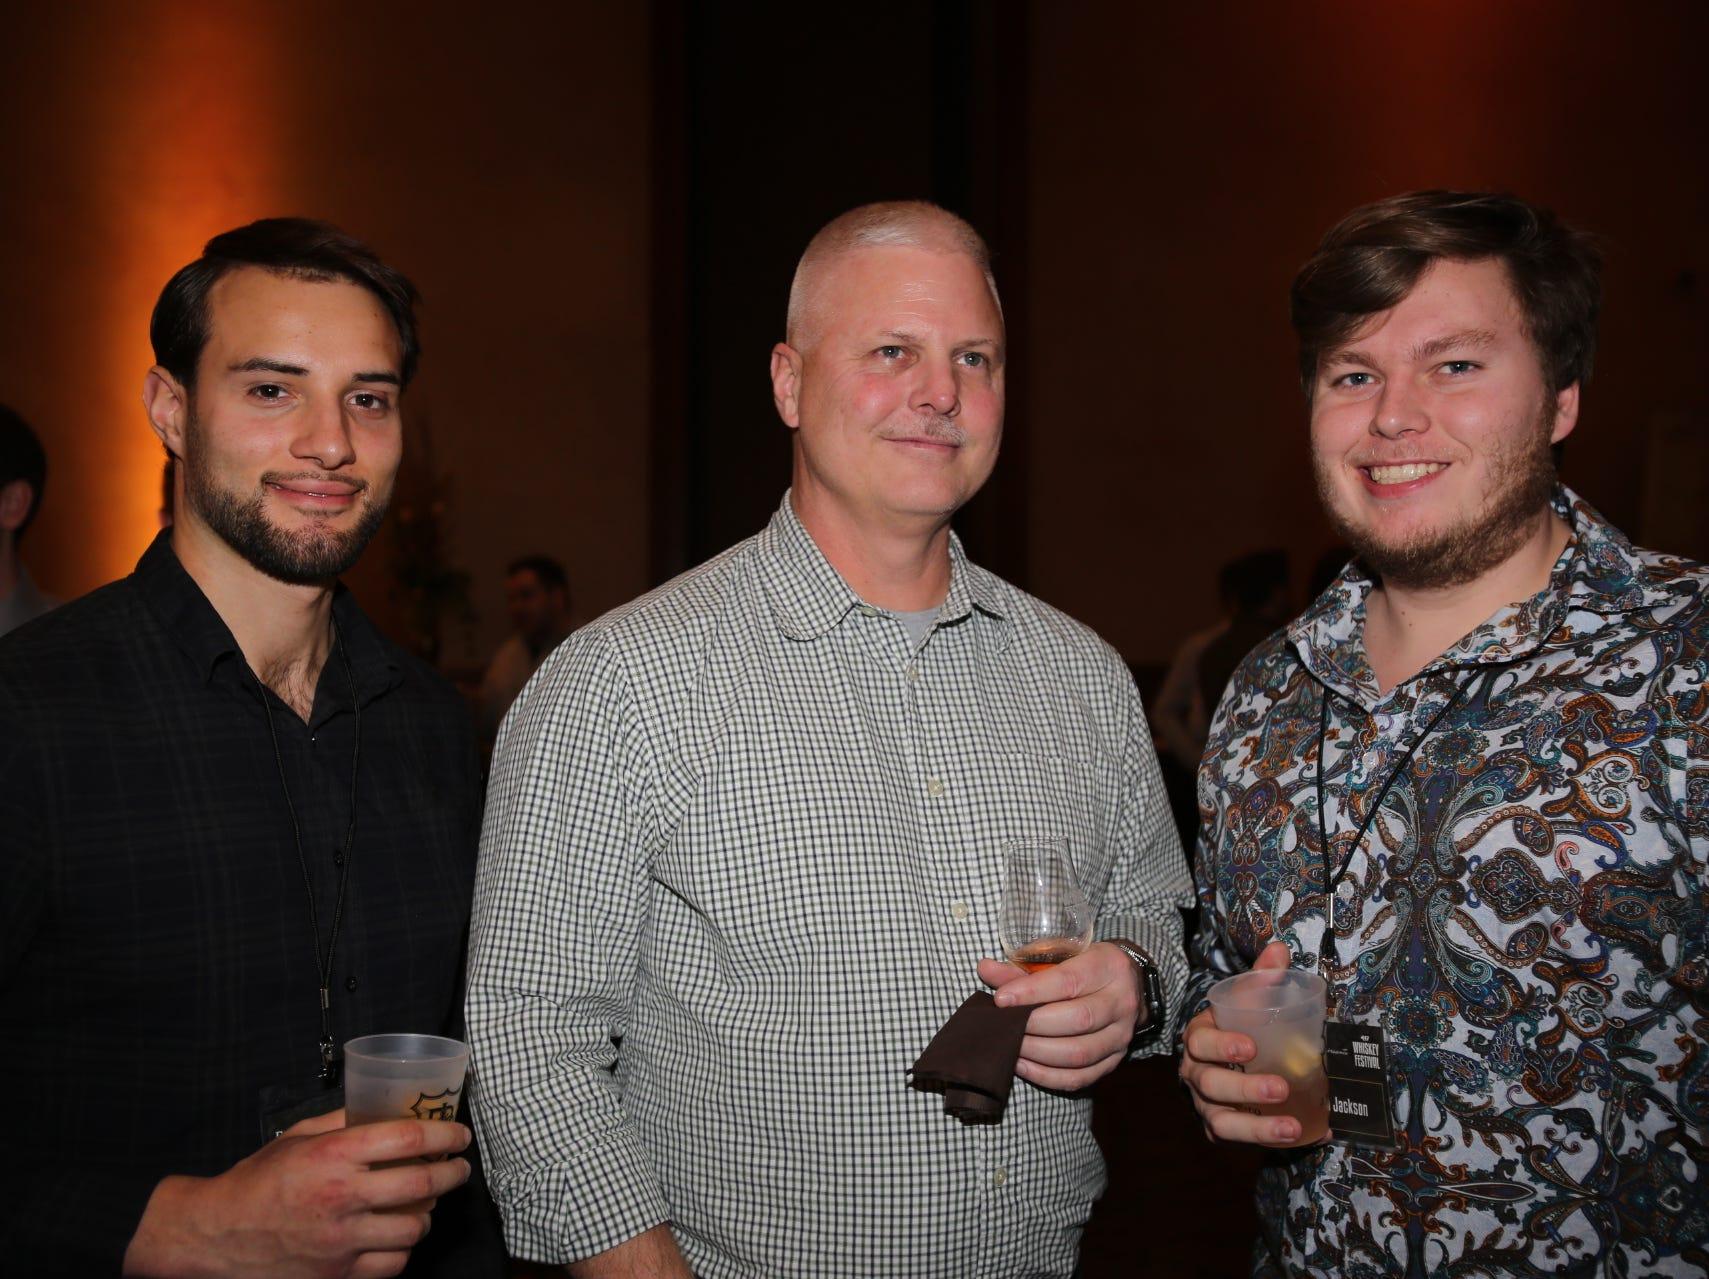 Zachary Lurvey, Mike Brown, and Austin Jackson